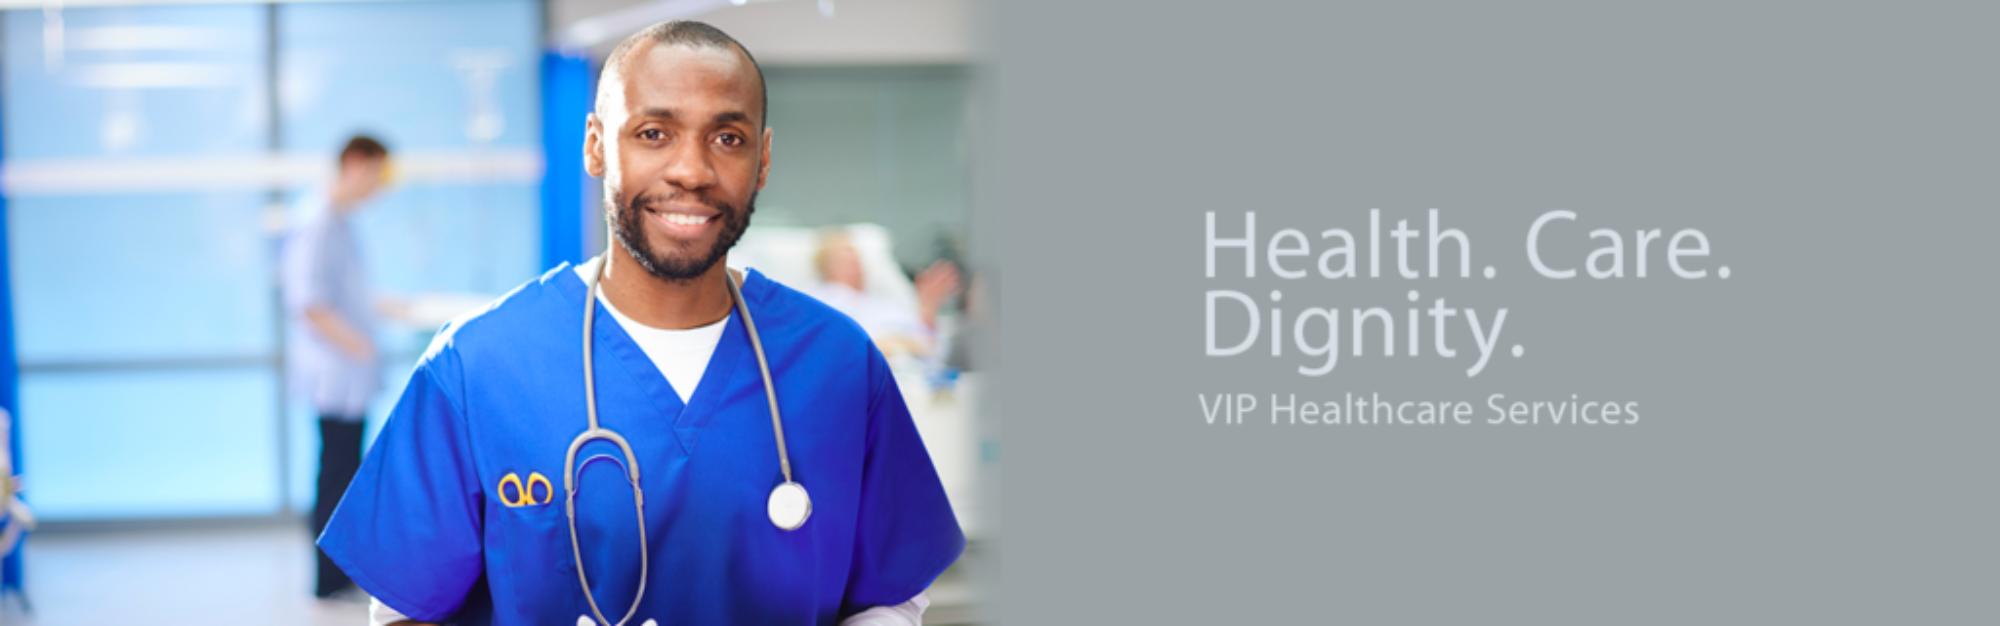 VIP HealthCareDignityBanner 3